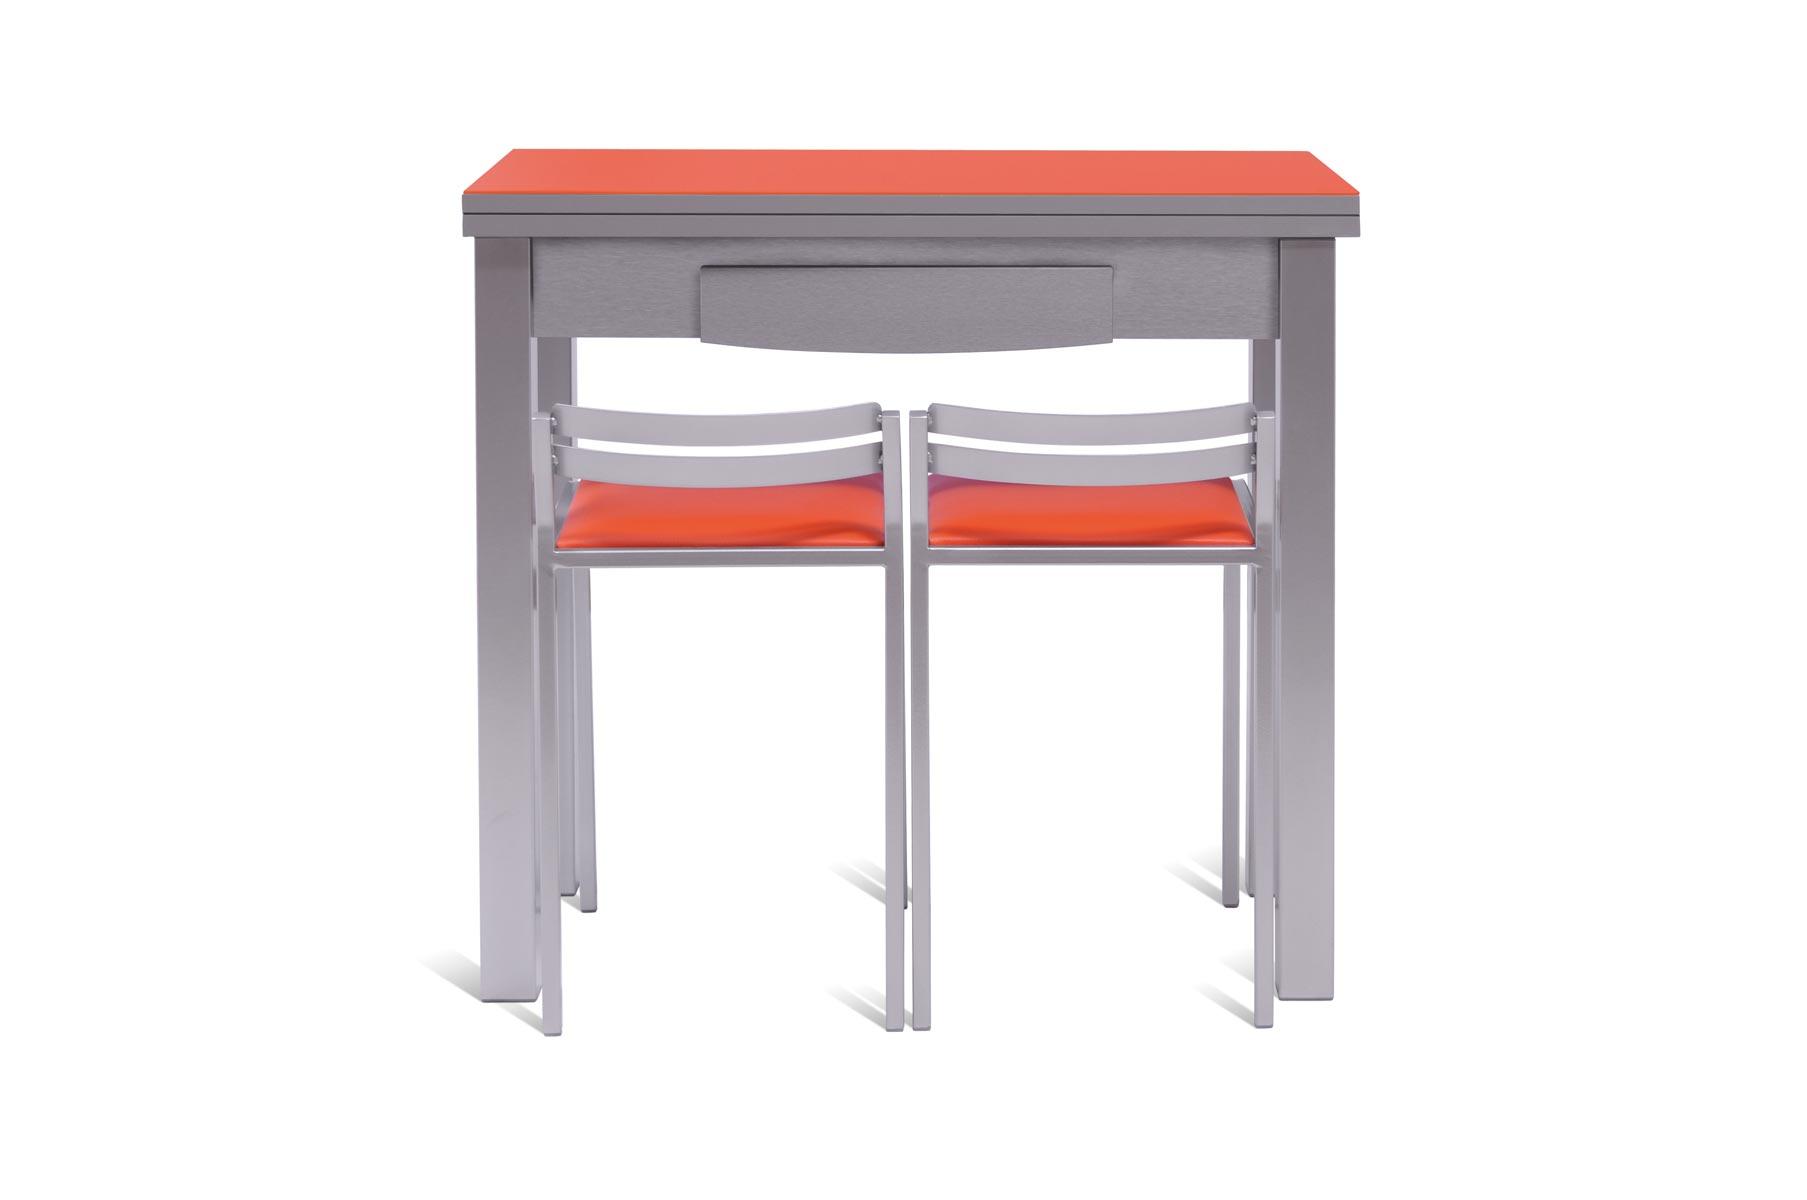 Mesa de cocina peque a y extensible - Cocinas pequenas con mesa ...